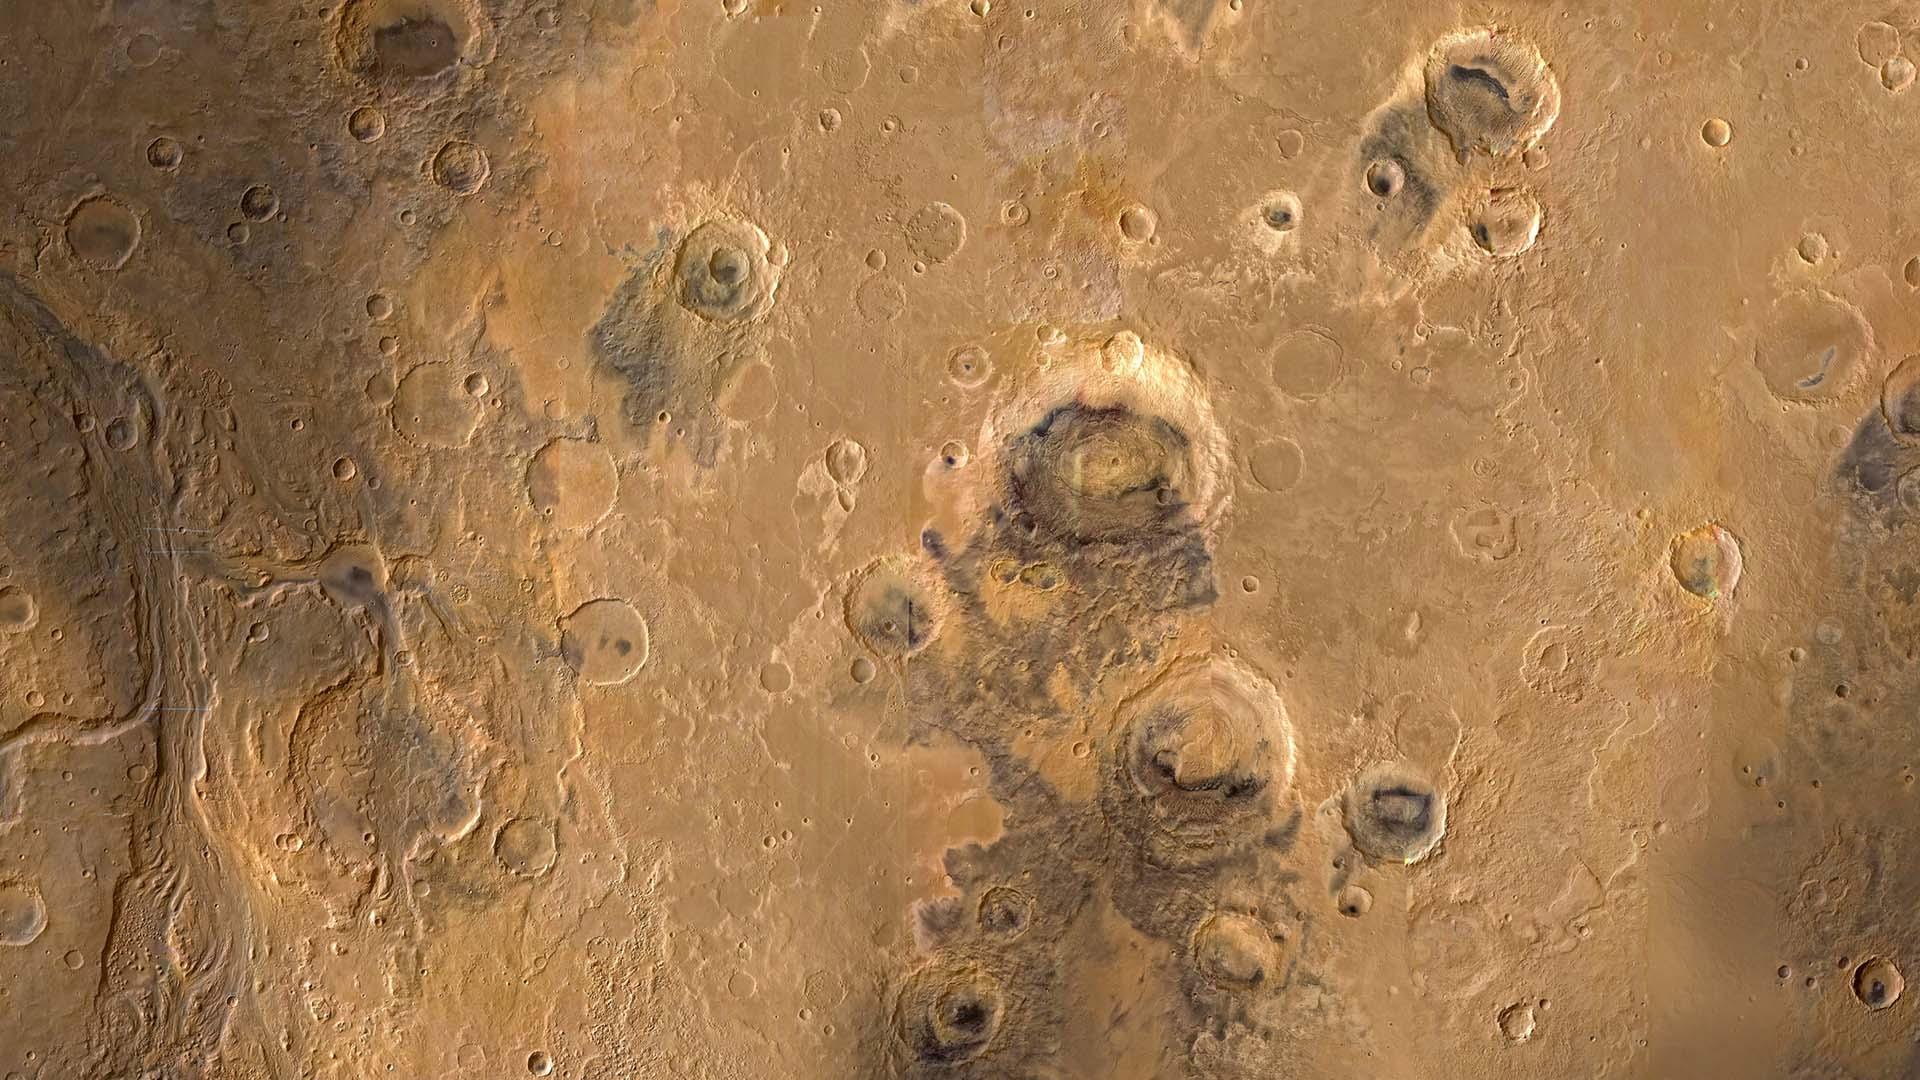 La NASA va envoyer un hélicoptère miniature sur Mars